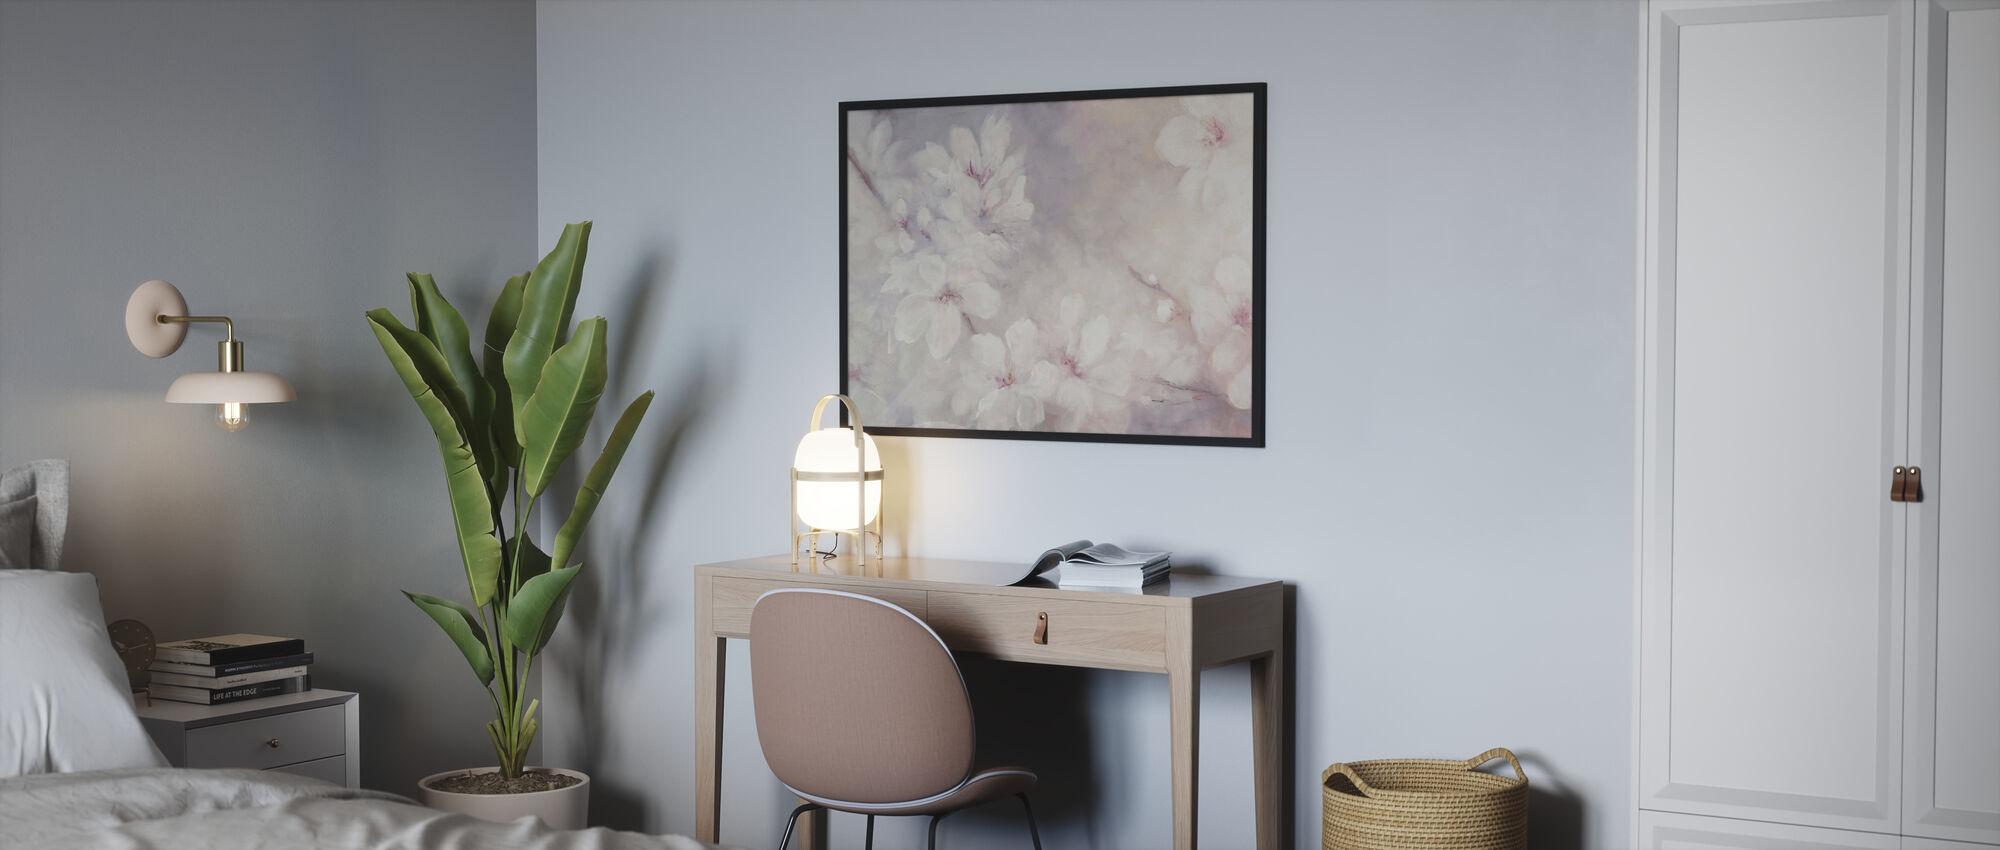 Kirschblüten Malerei - Poster - Schlafzimmer